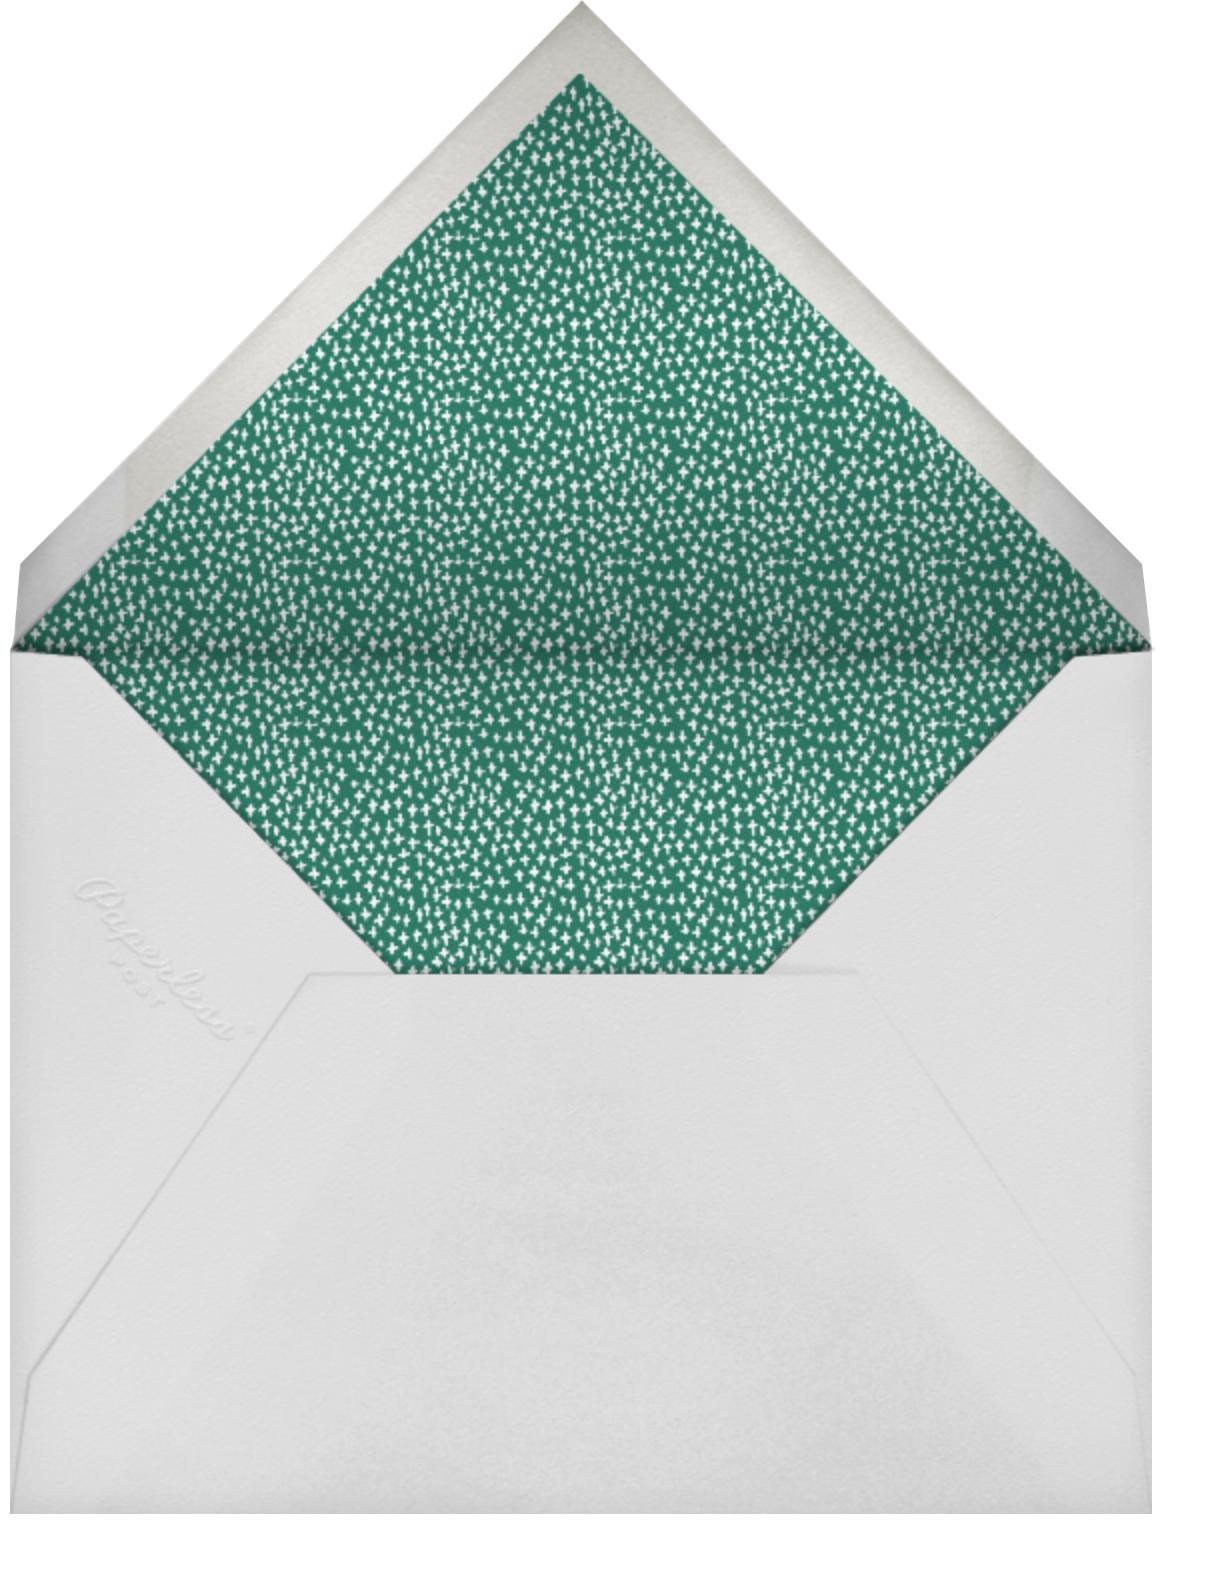 Takeaway Tree - Mr. Boddington's Studio - Envelope